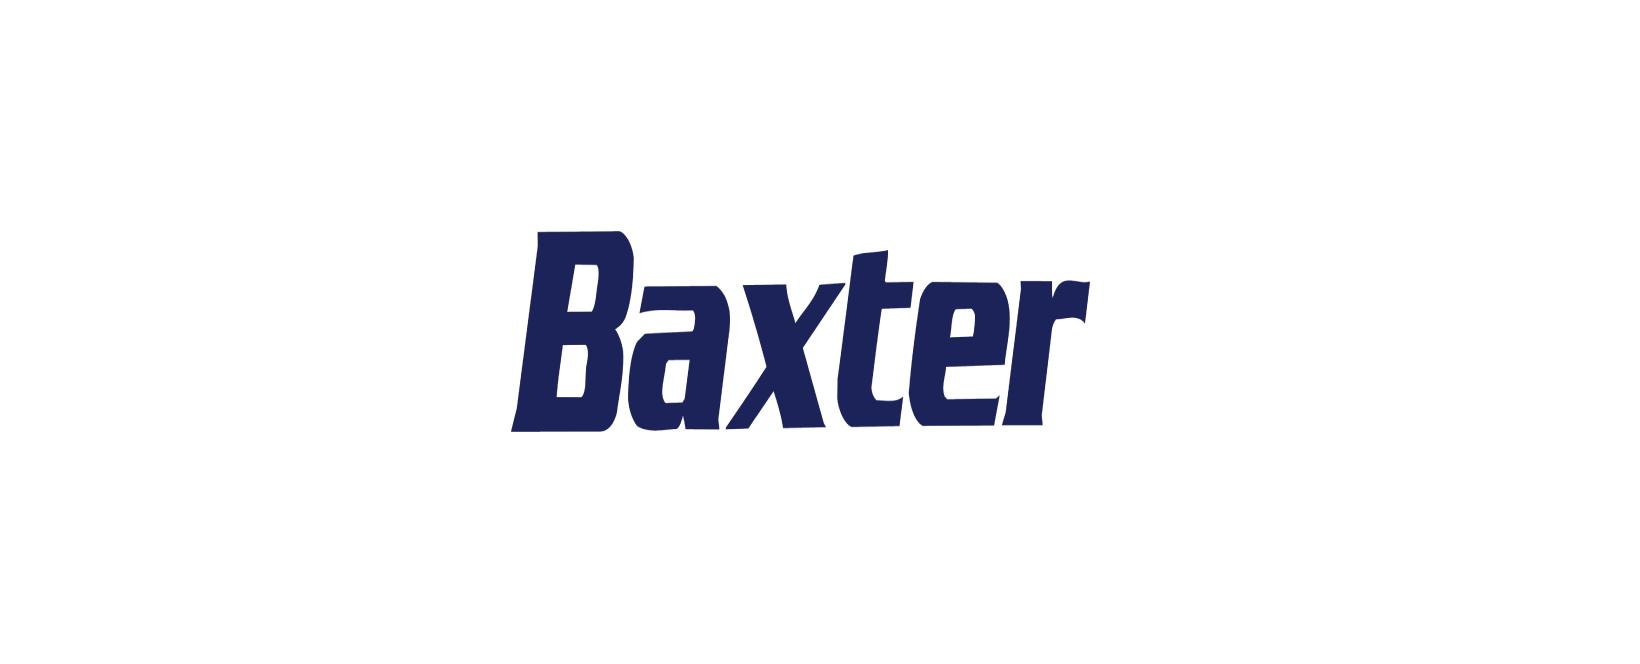 Baxter Blue Glasses Coupon Code 2021